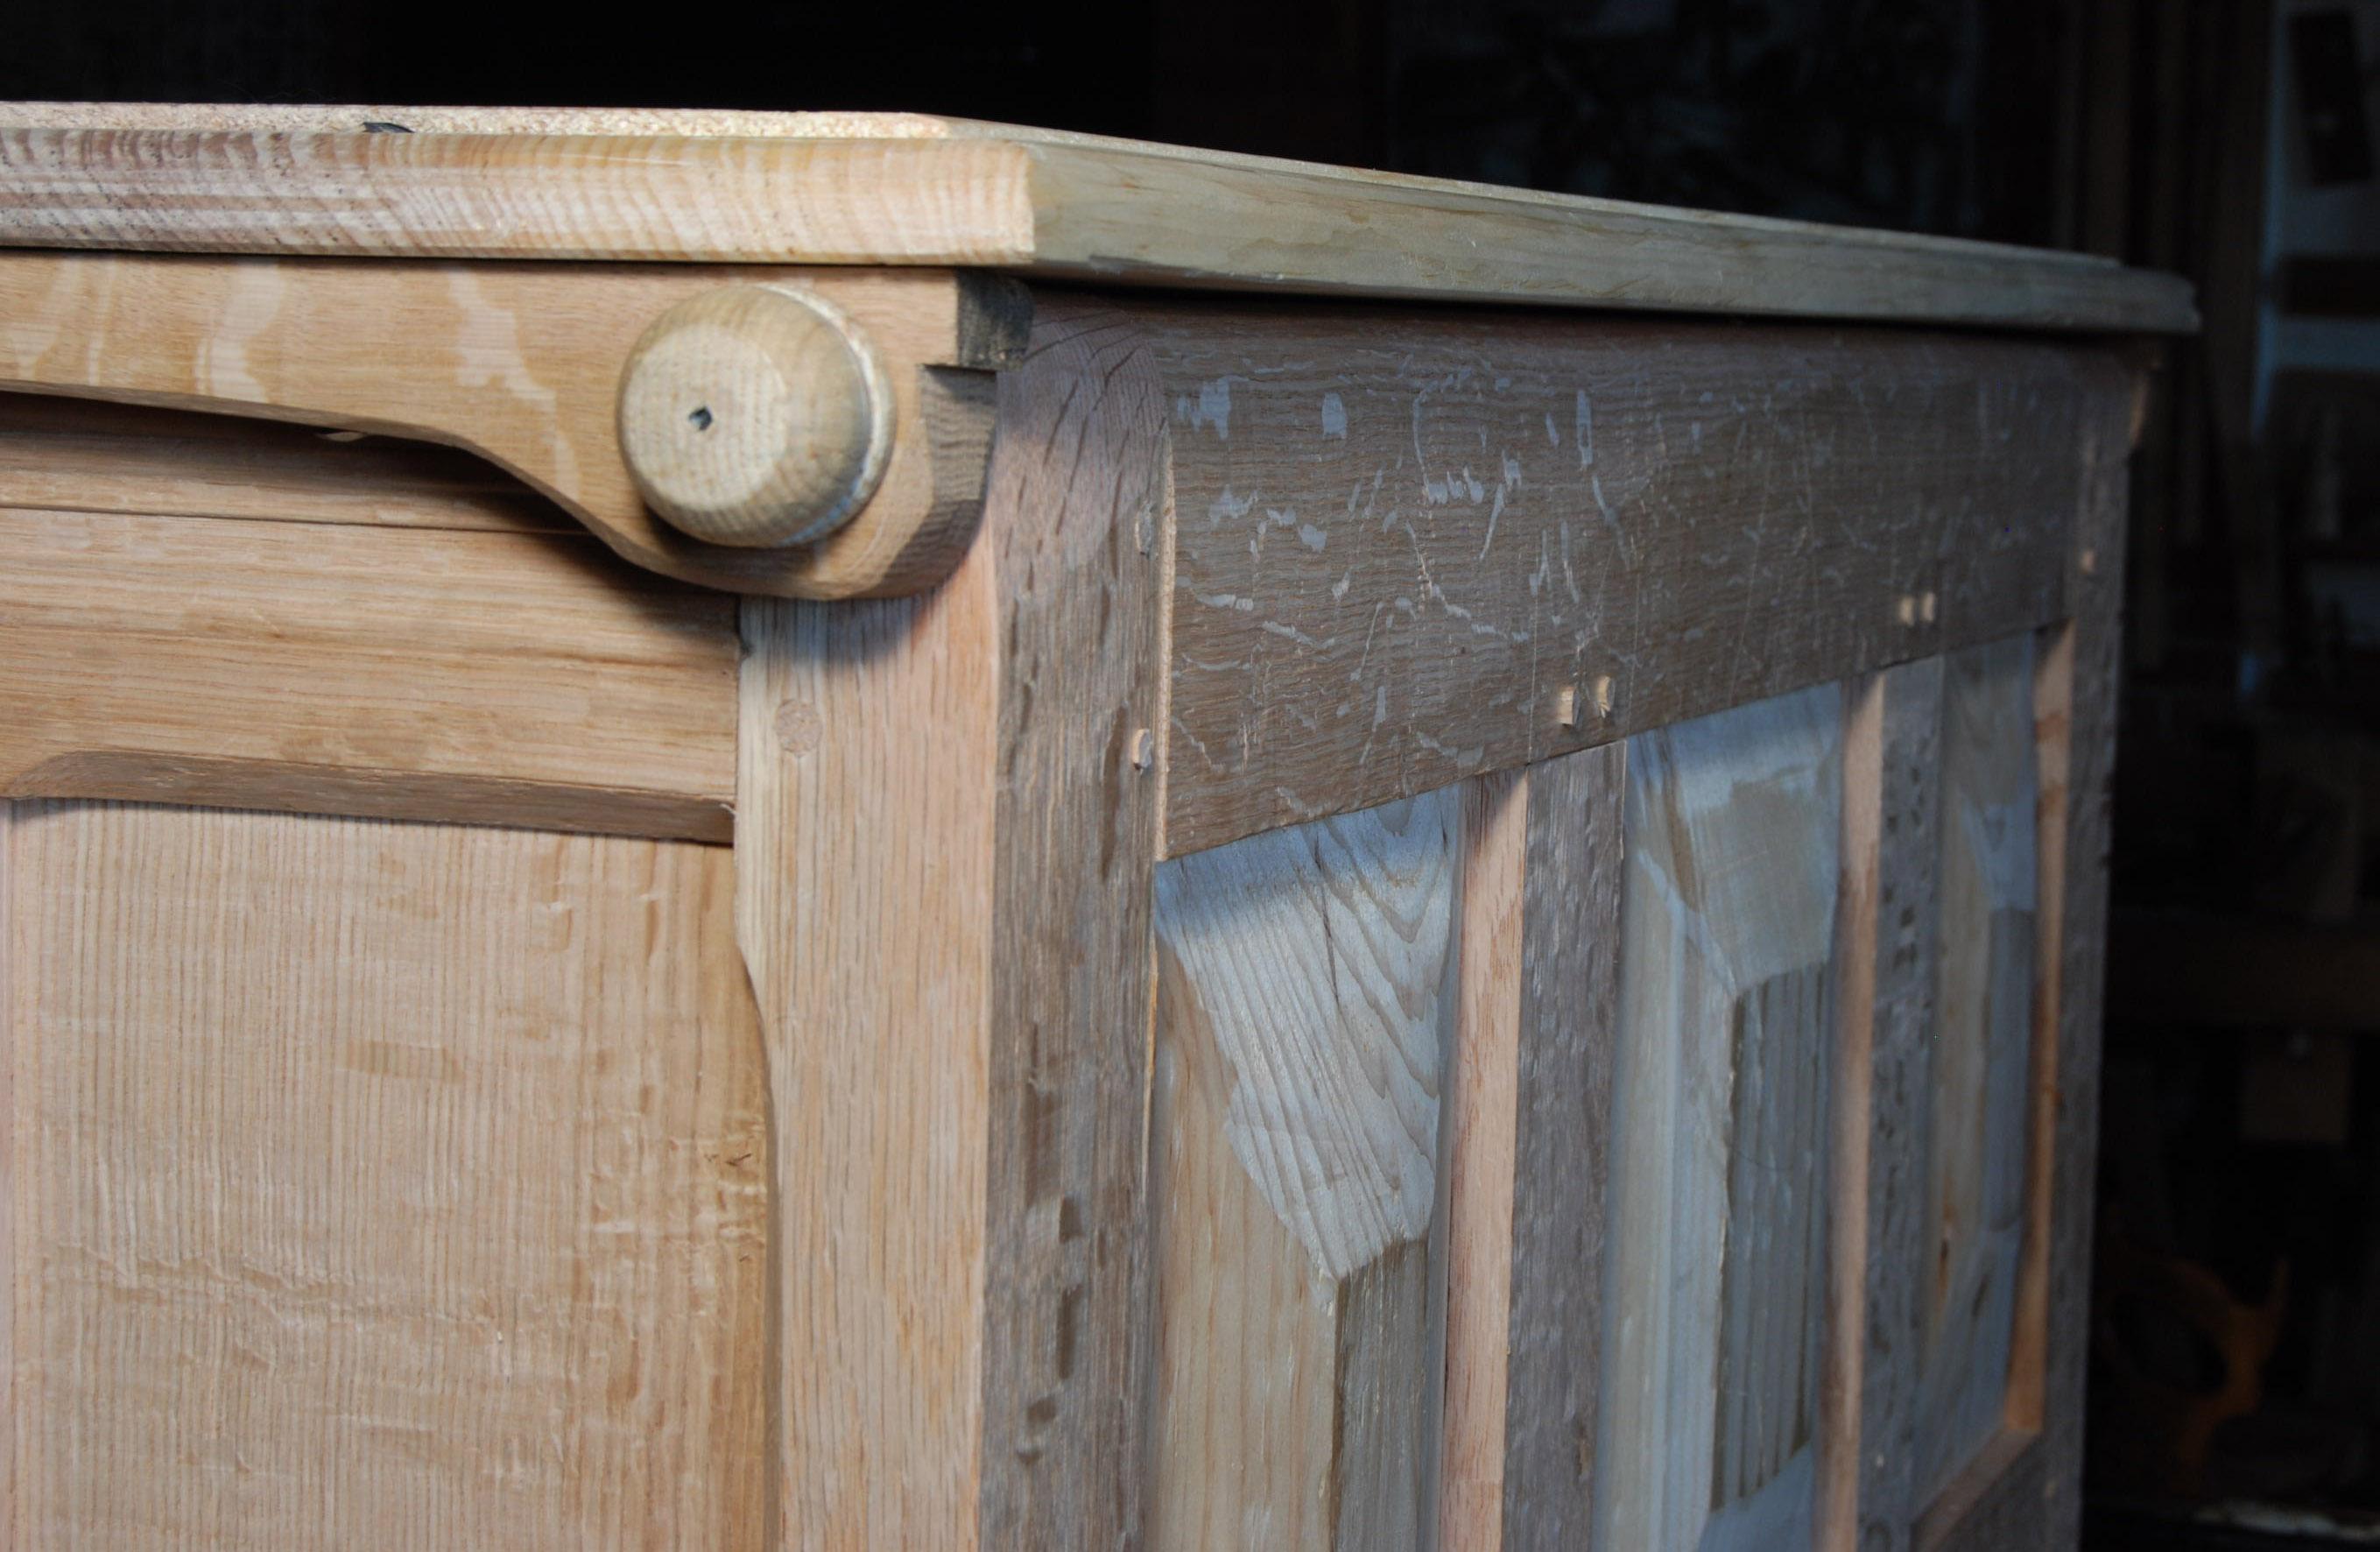 Wood Door Hinges Free Download pergola building plans | defective44pjo